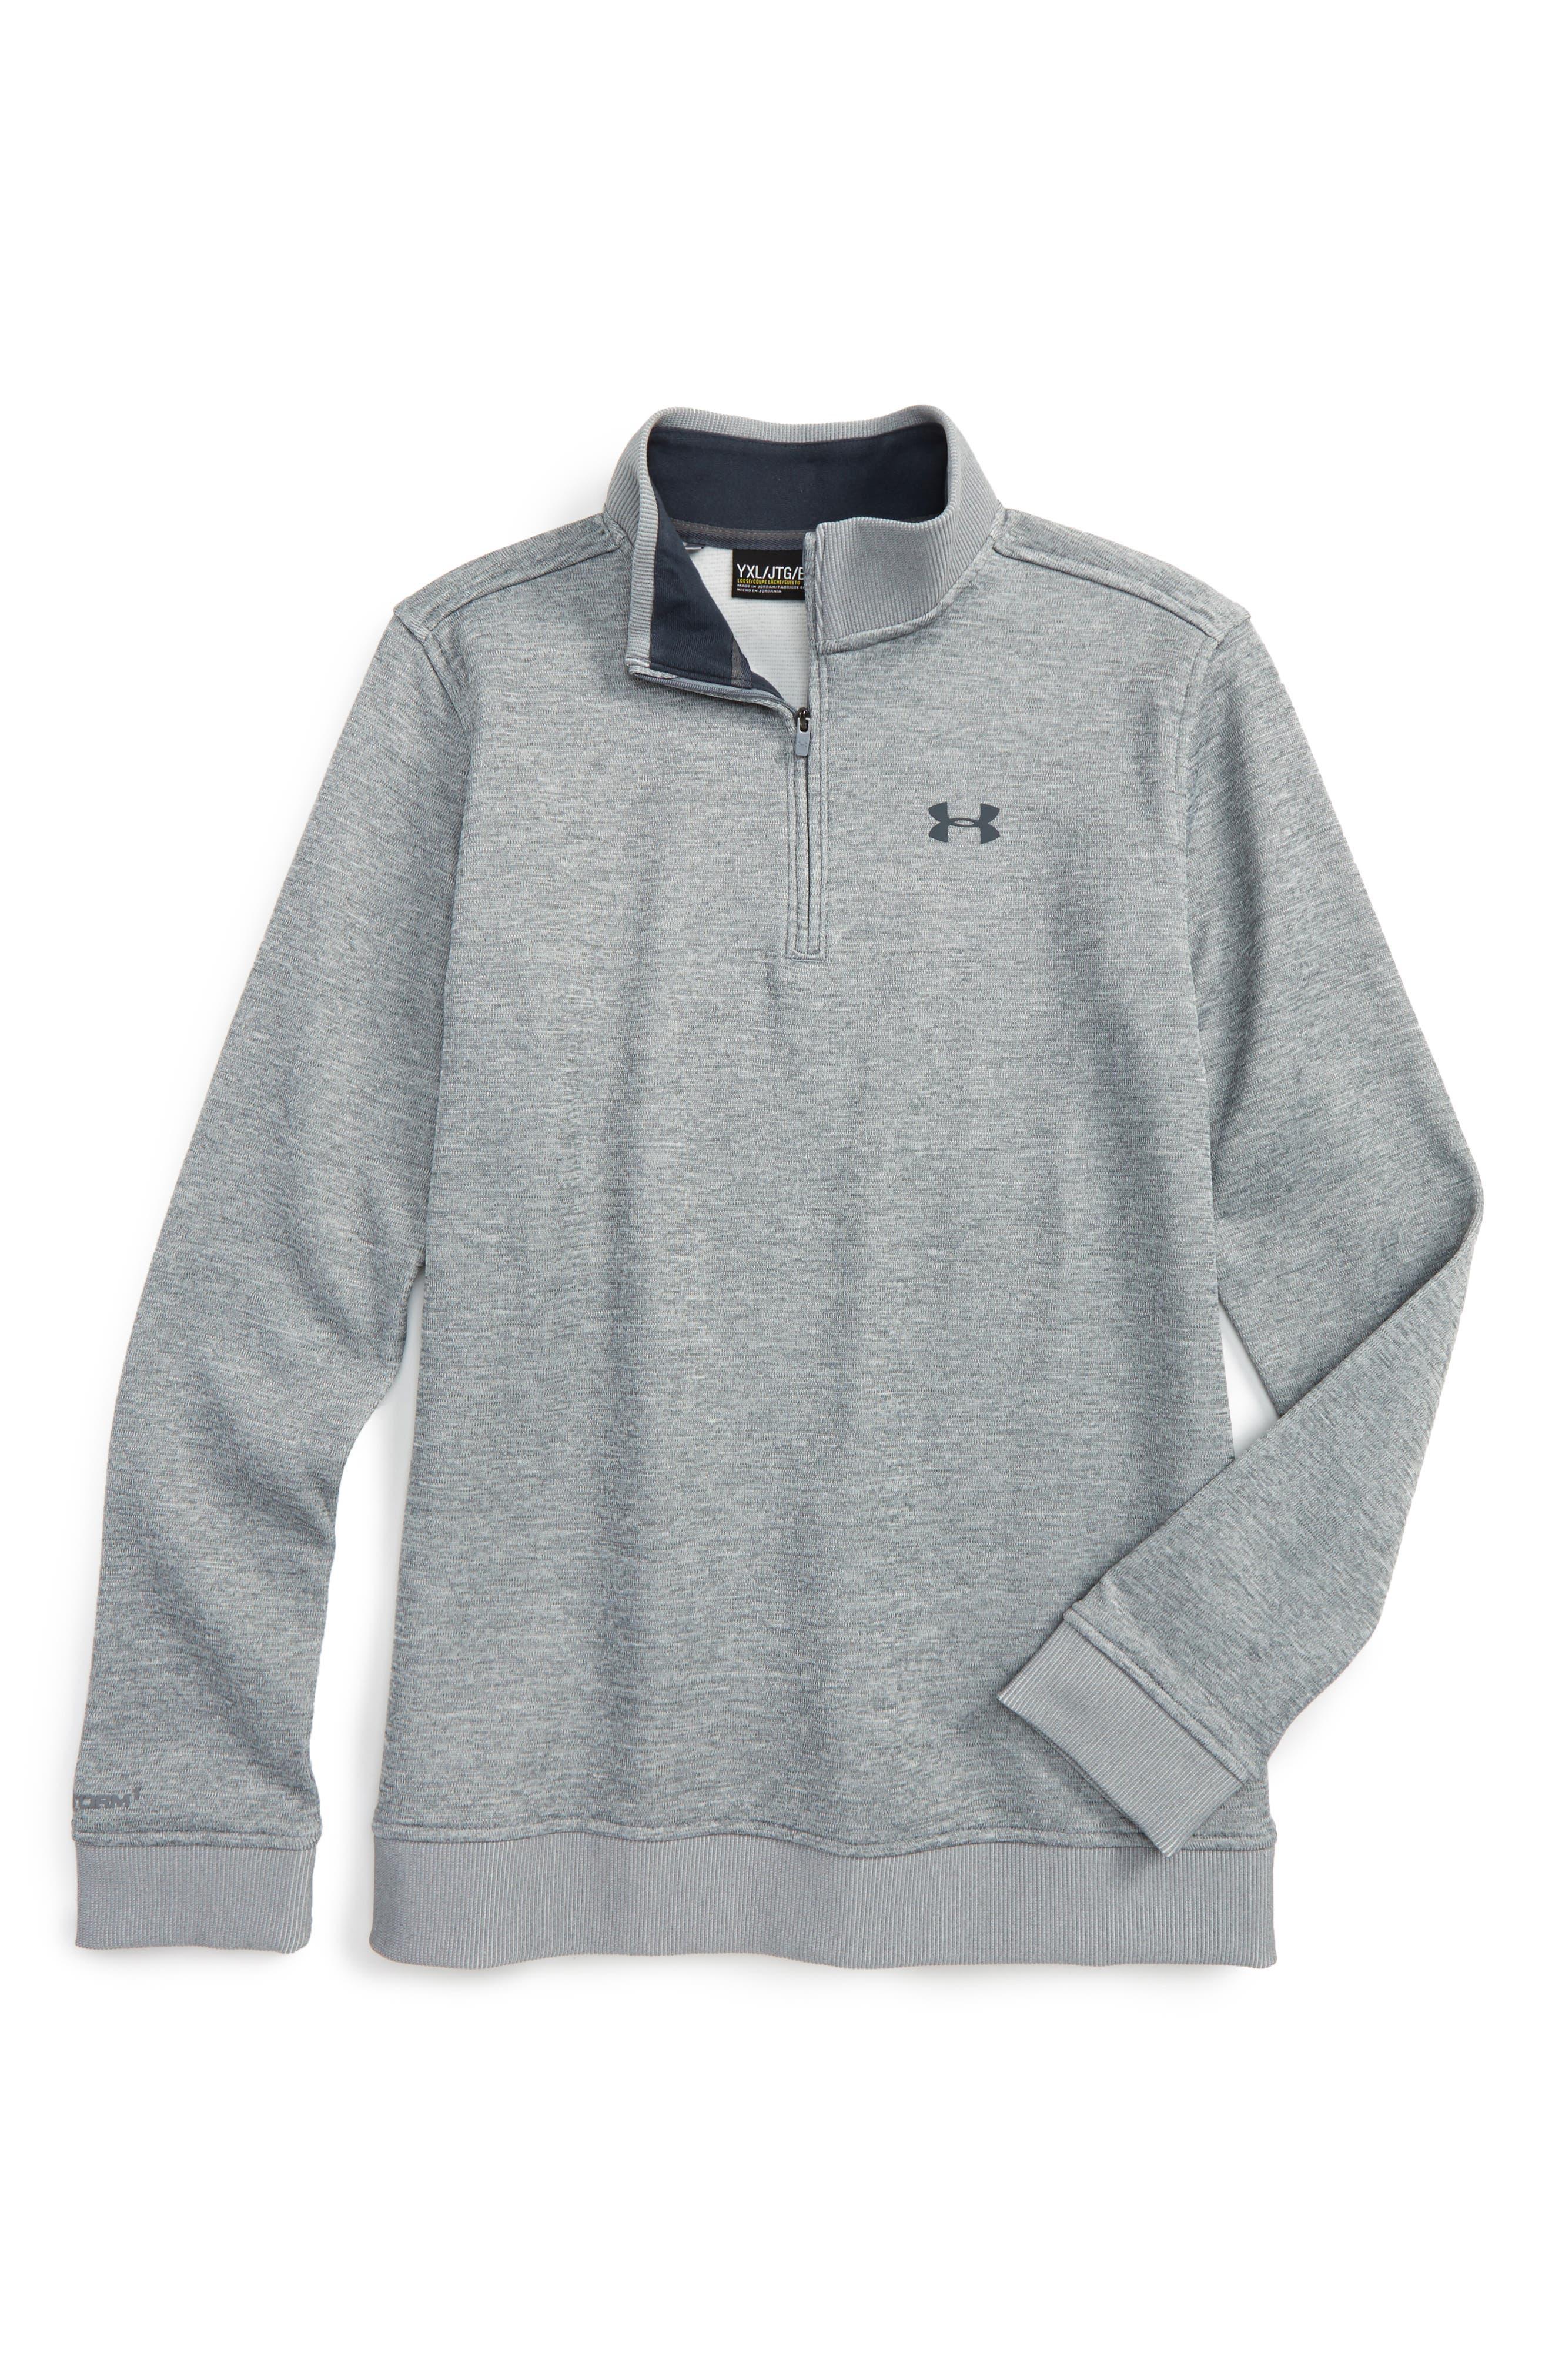 Under Armour Storm Quarter Zip Sweater (Little Boys & Big Boys)